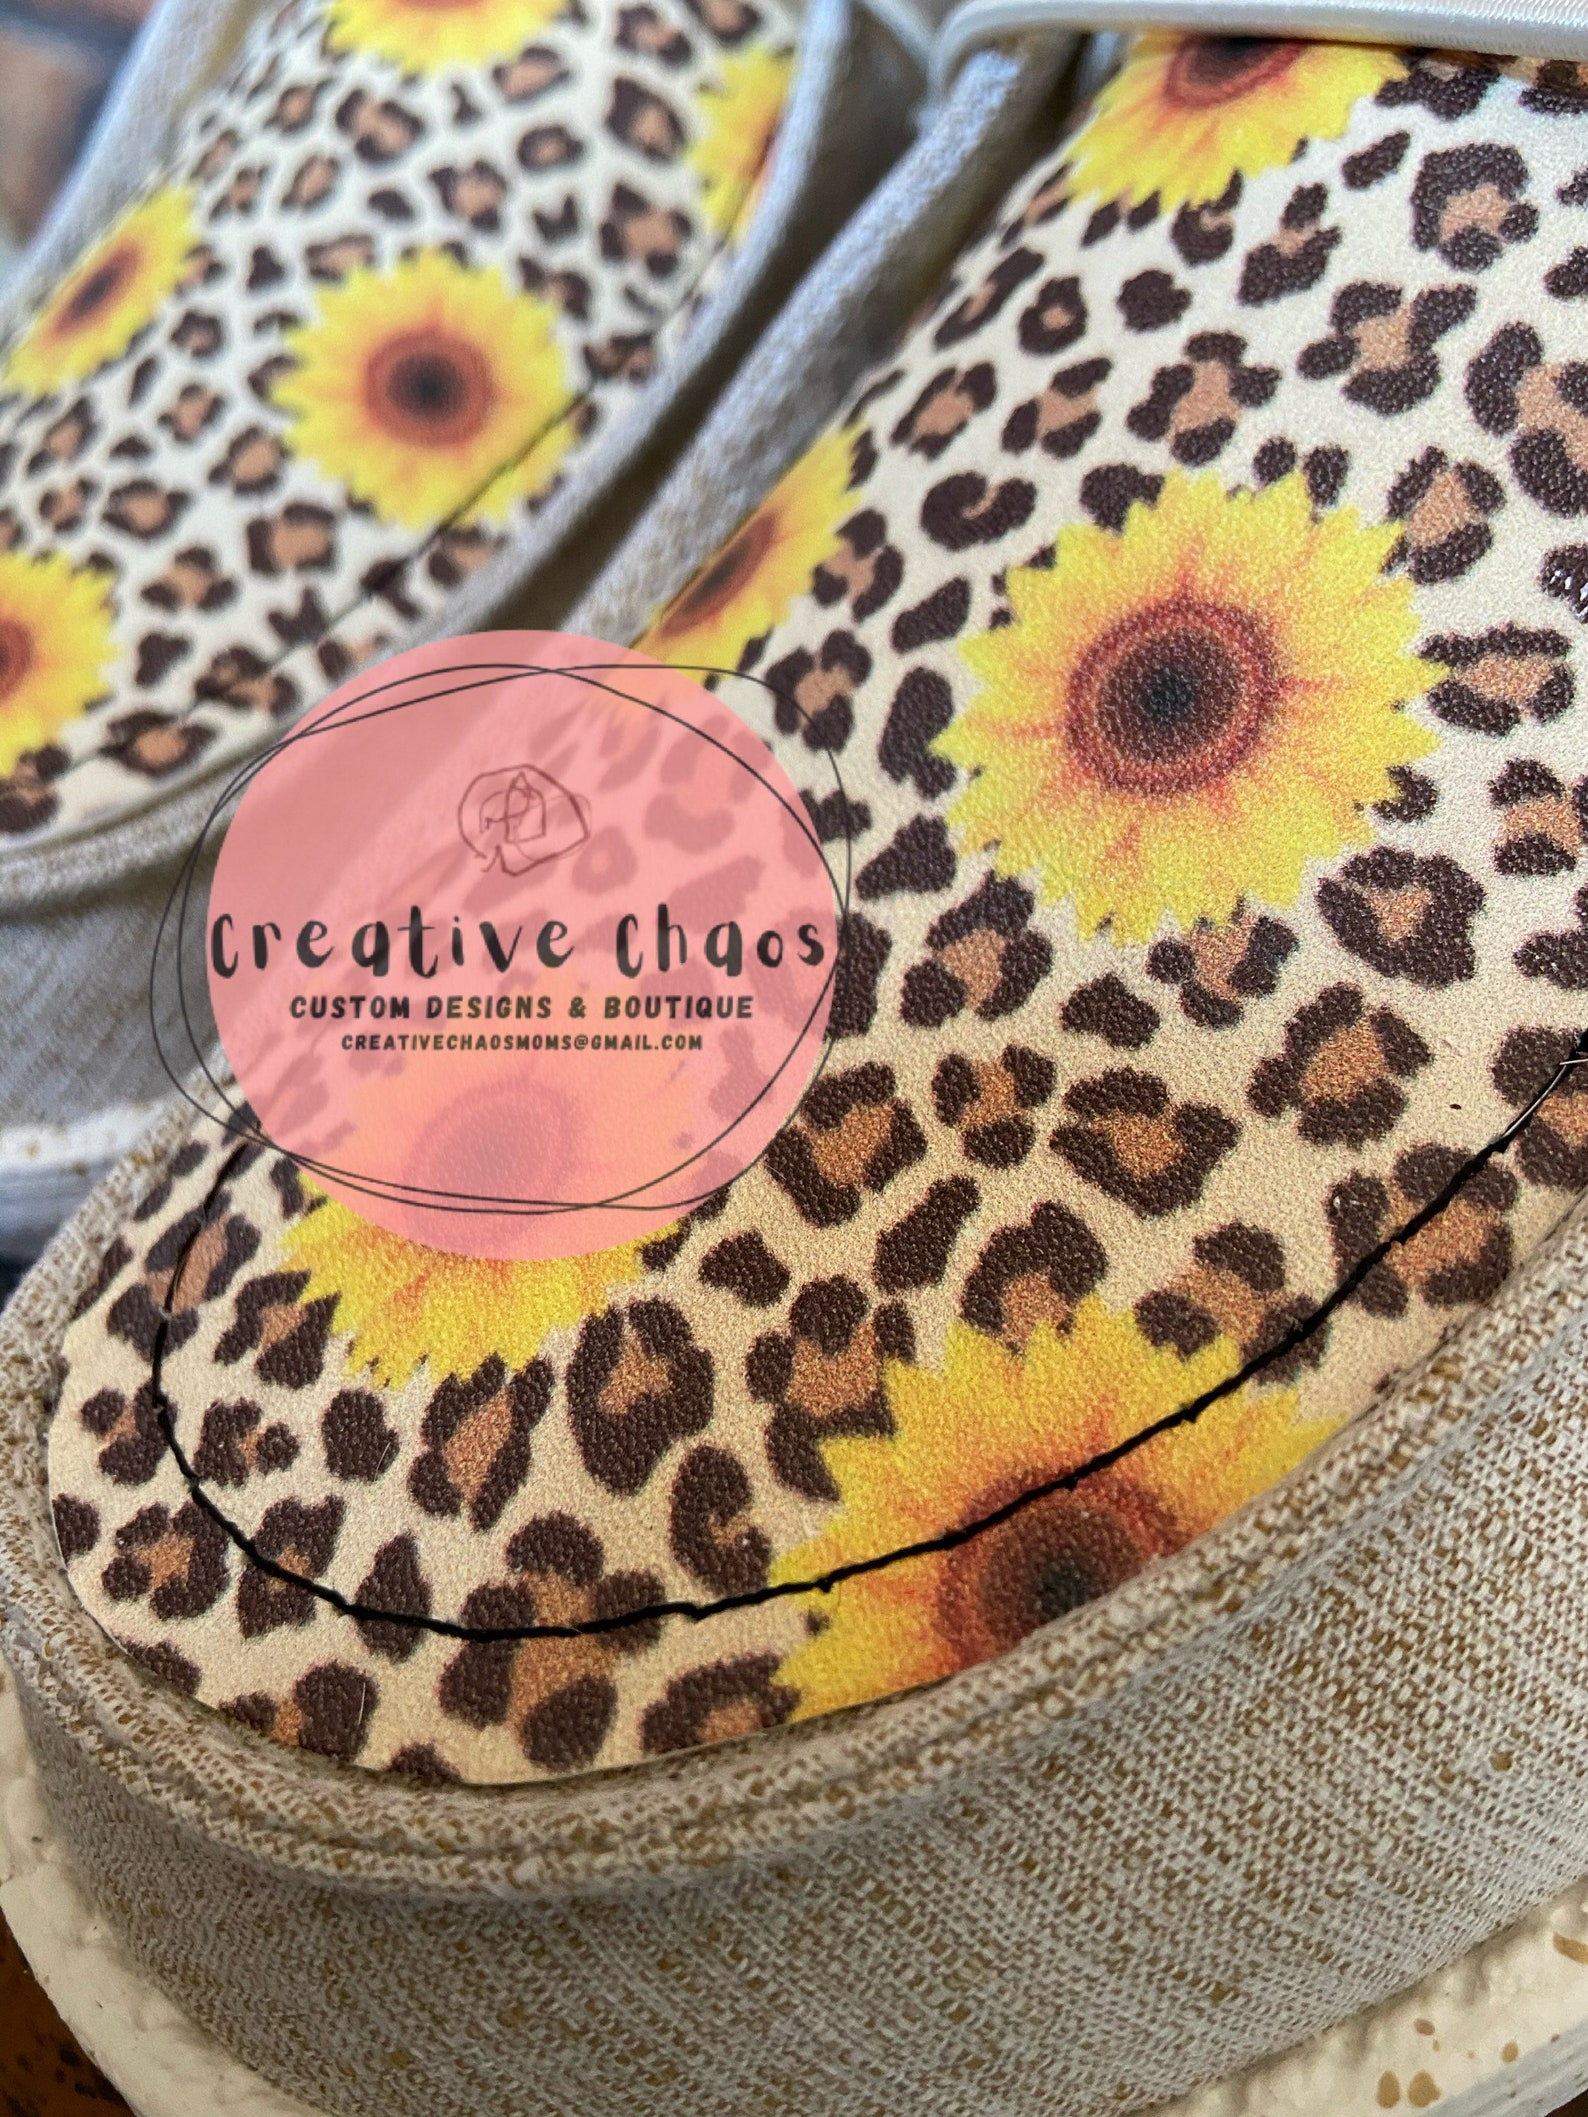 Cheetah & Sunflower Hey Dudes w/ Hair on Cowhide | Etsy